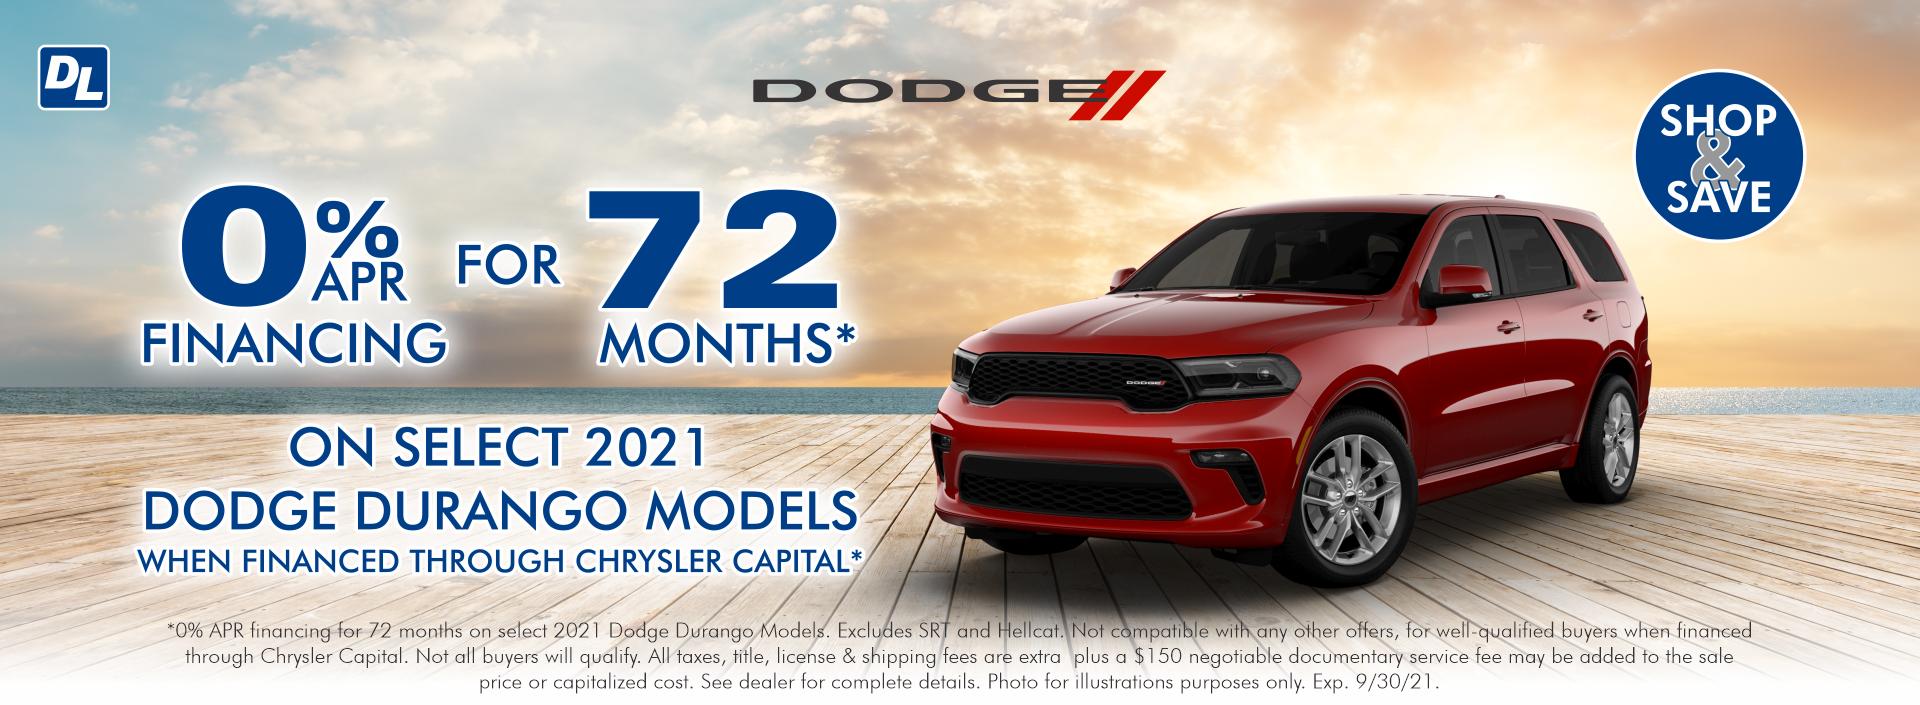 2021SeptBanners-CDJR-Dodge-2